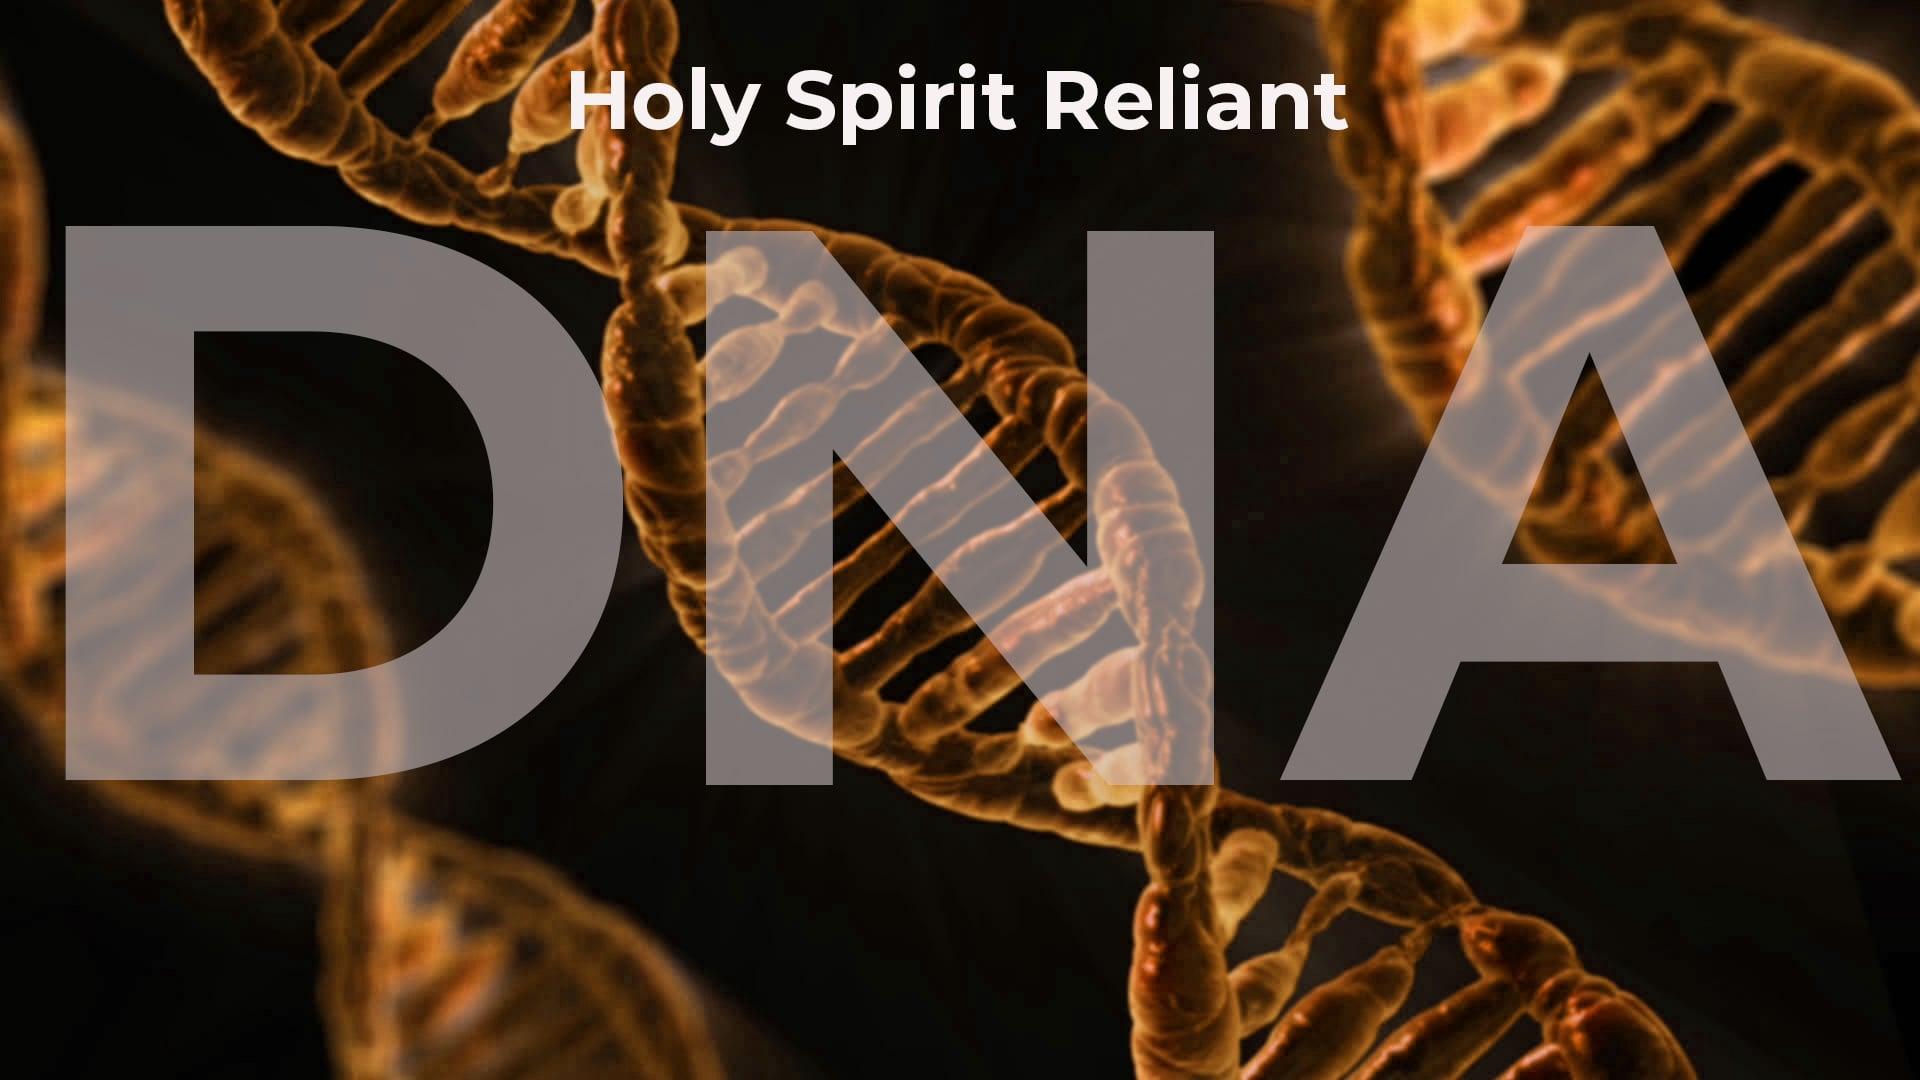 DNA - Holy Spirit Reliant - Part 2